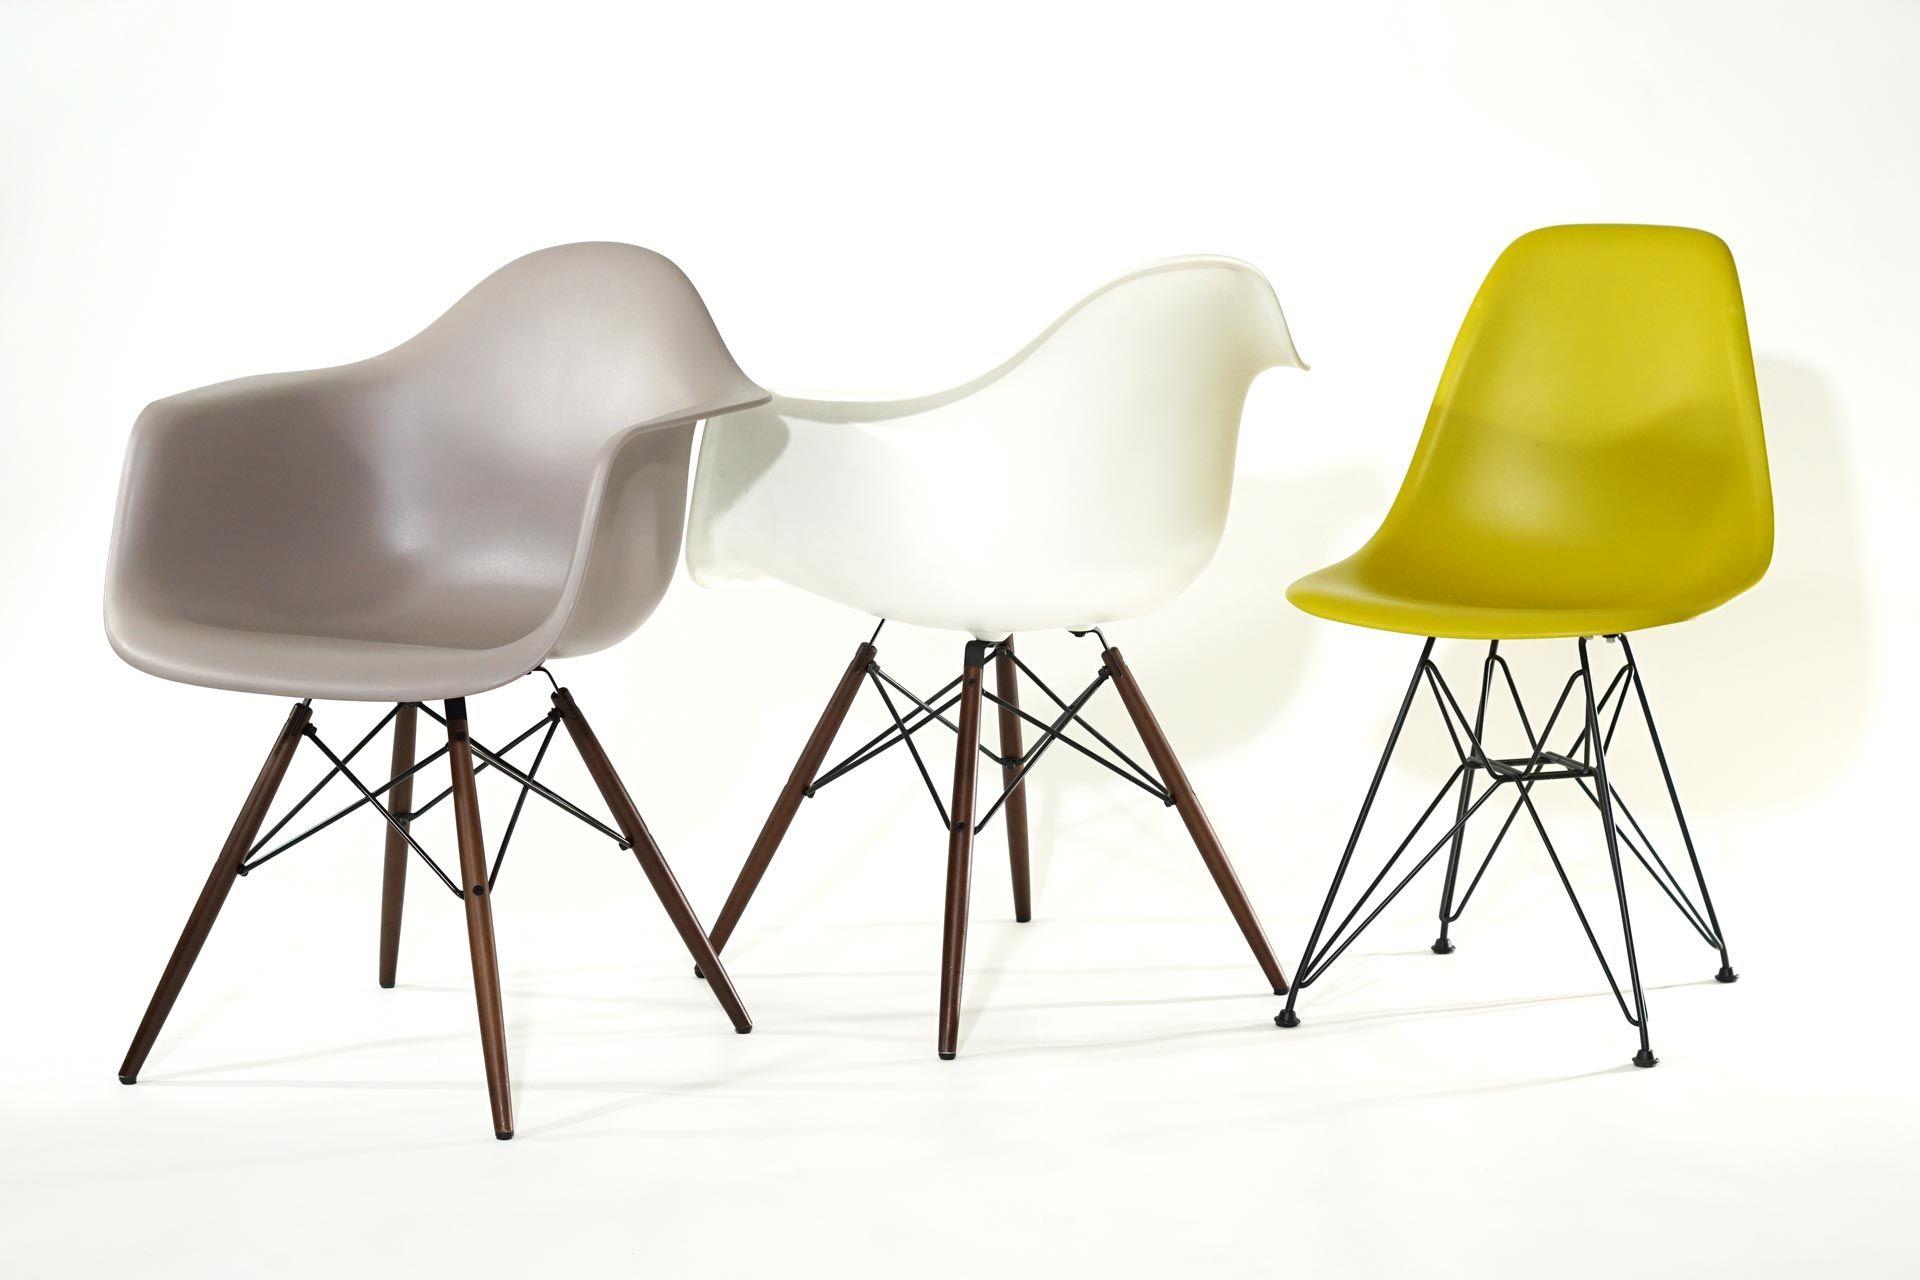 Vitra Eames Plastic Chairs Eames Stuhle Designklassiker